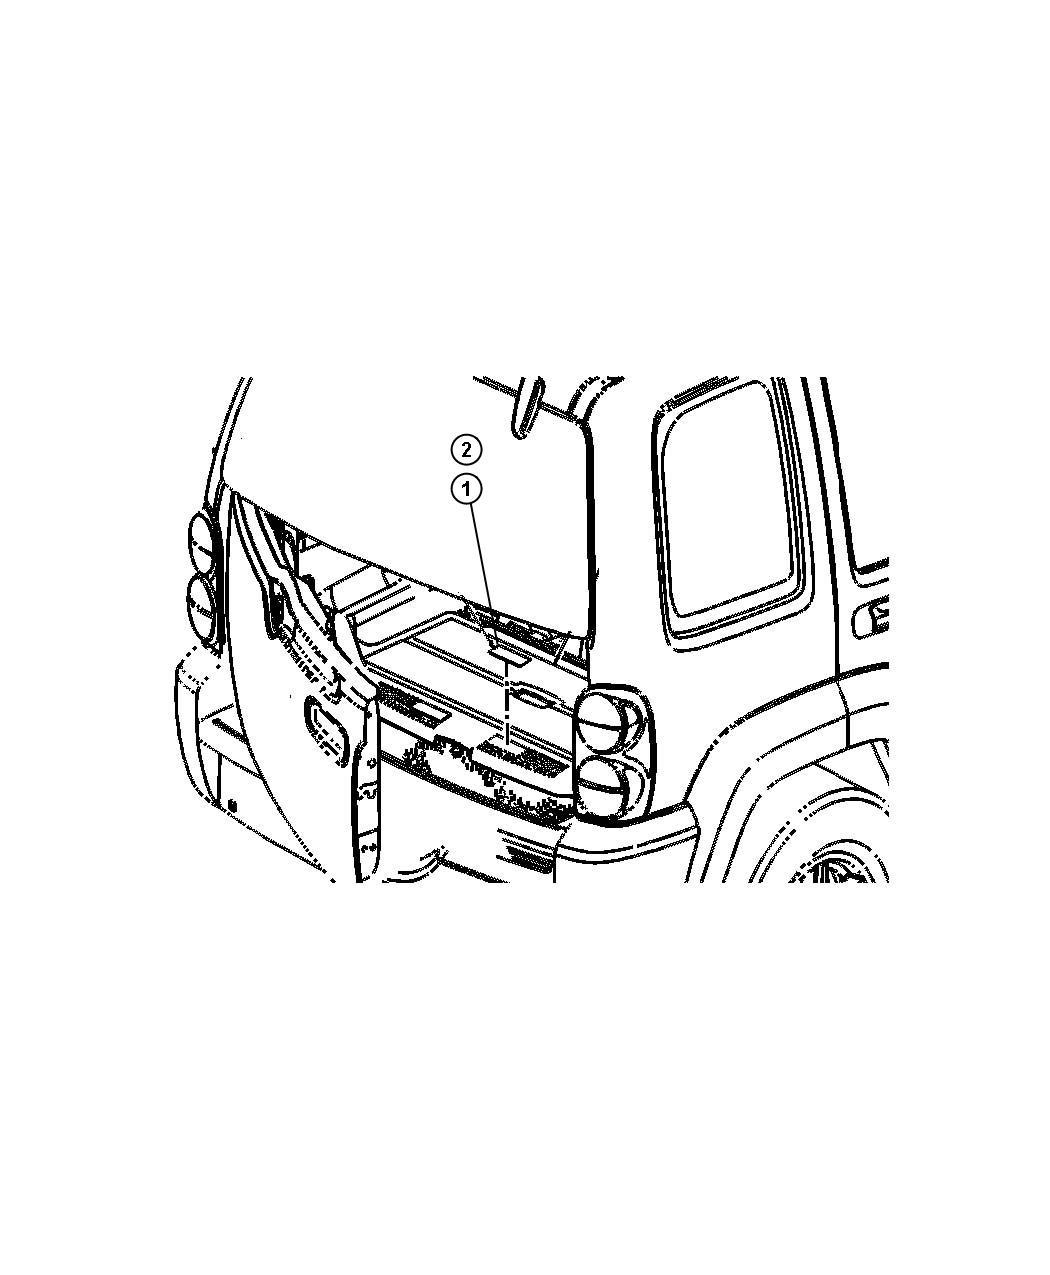 2007 Jeep Liberty Label. Brake fluid warning, master